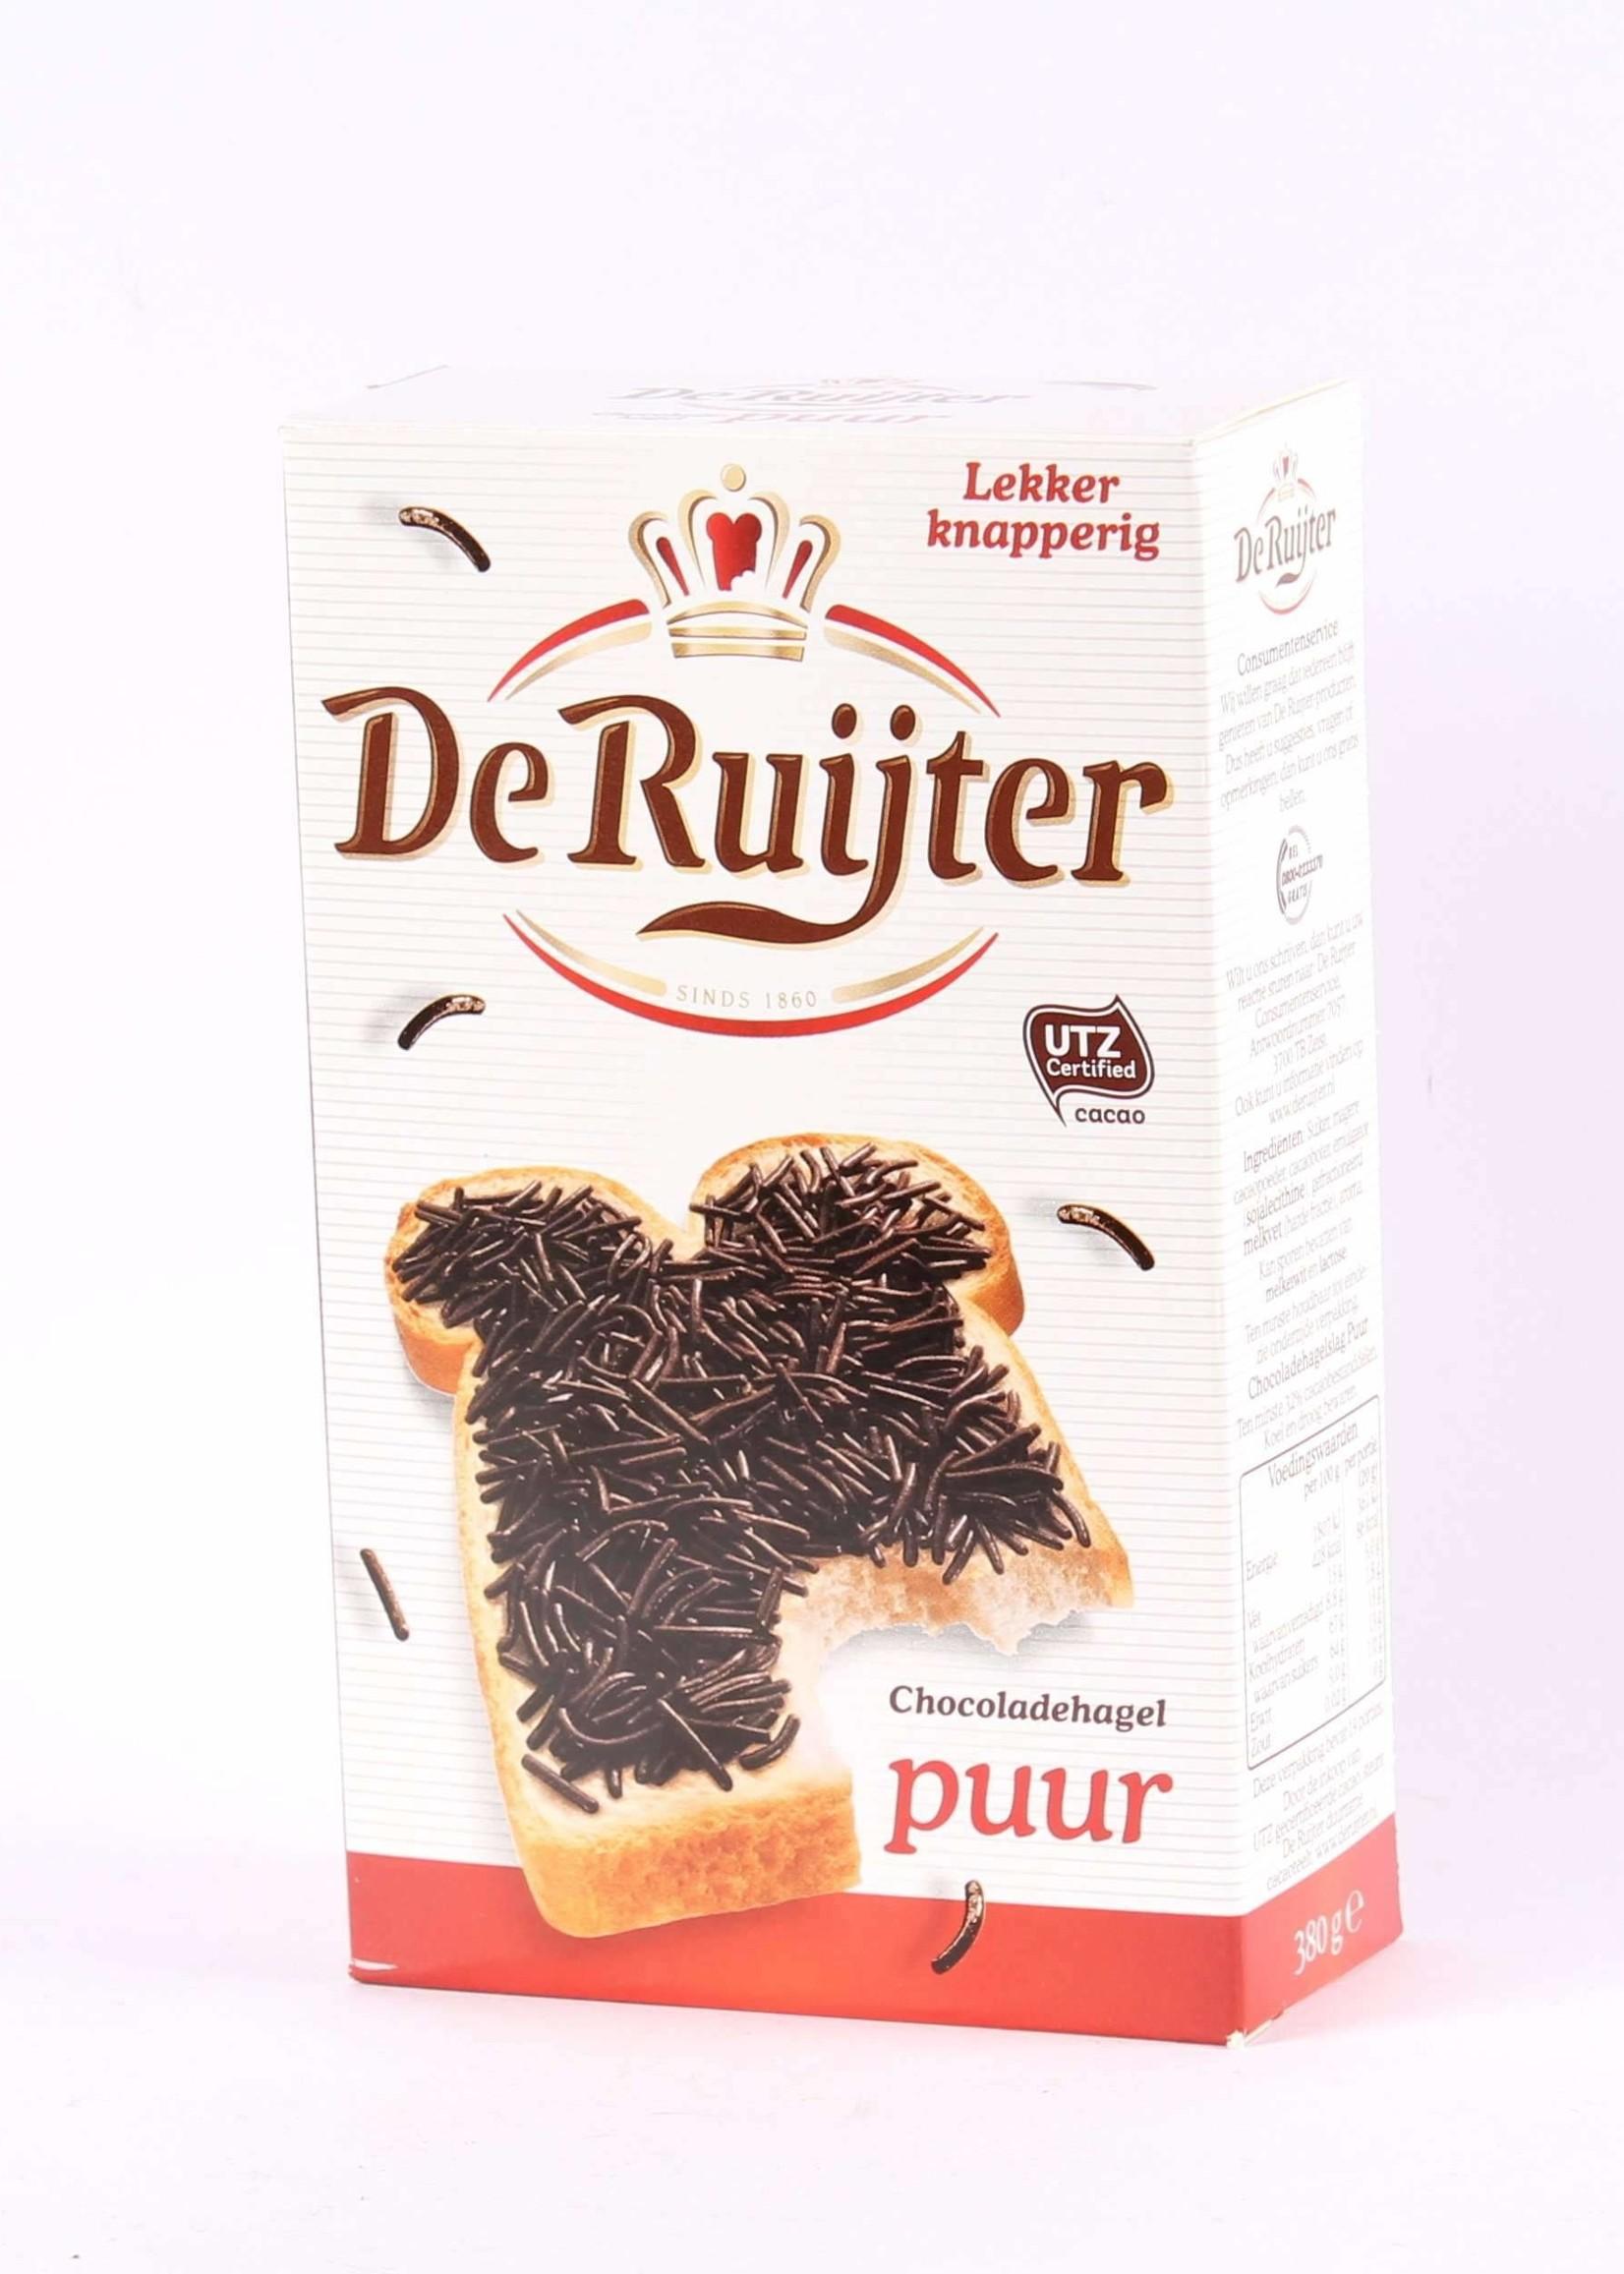 De Ruijter, Hagelslag Puur, Dark Chocolate Sprinkles